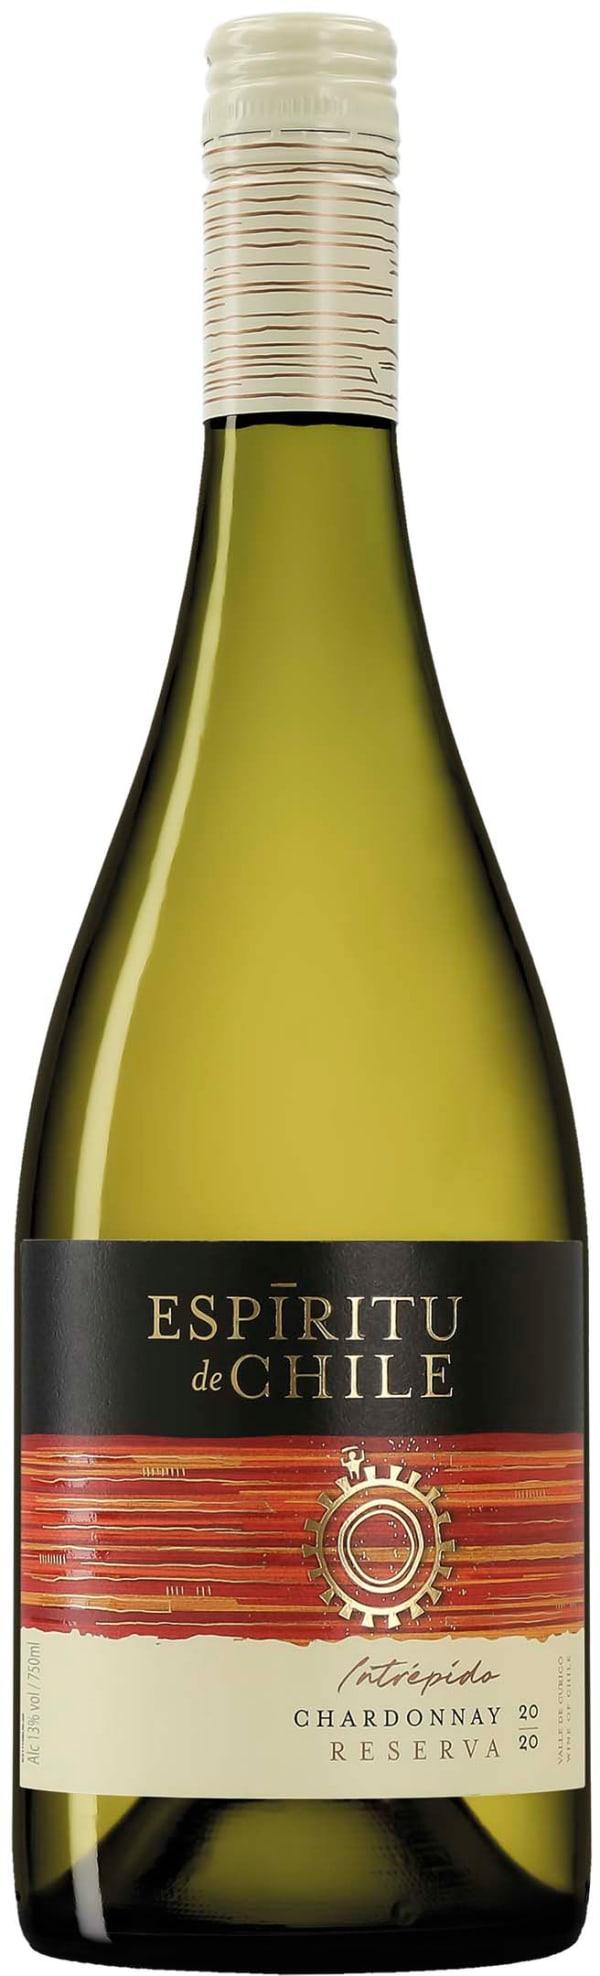 Espíritu de Chile Reserva Chardonnay 2016